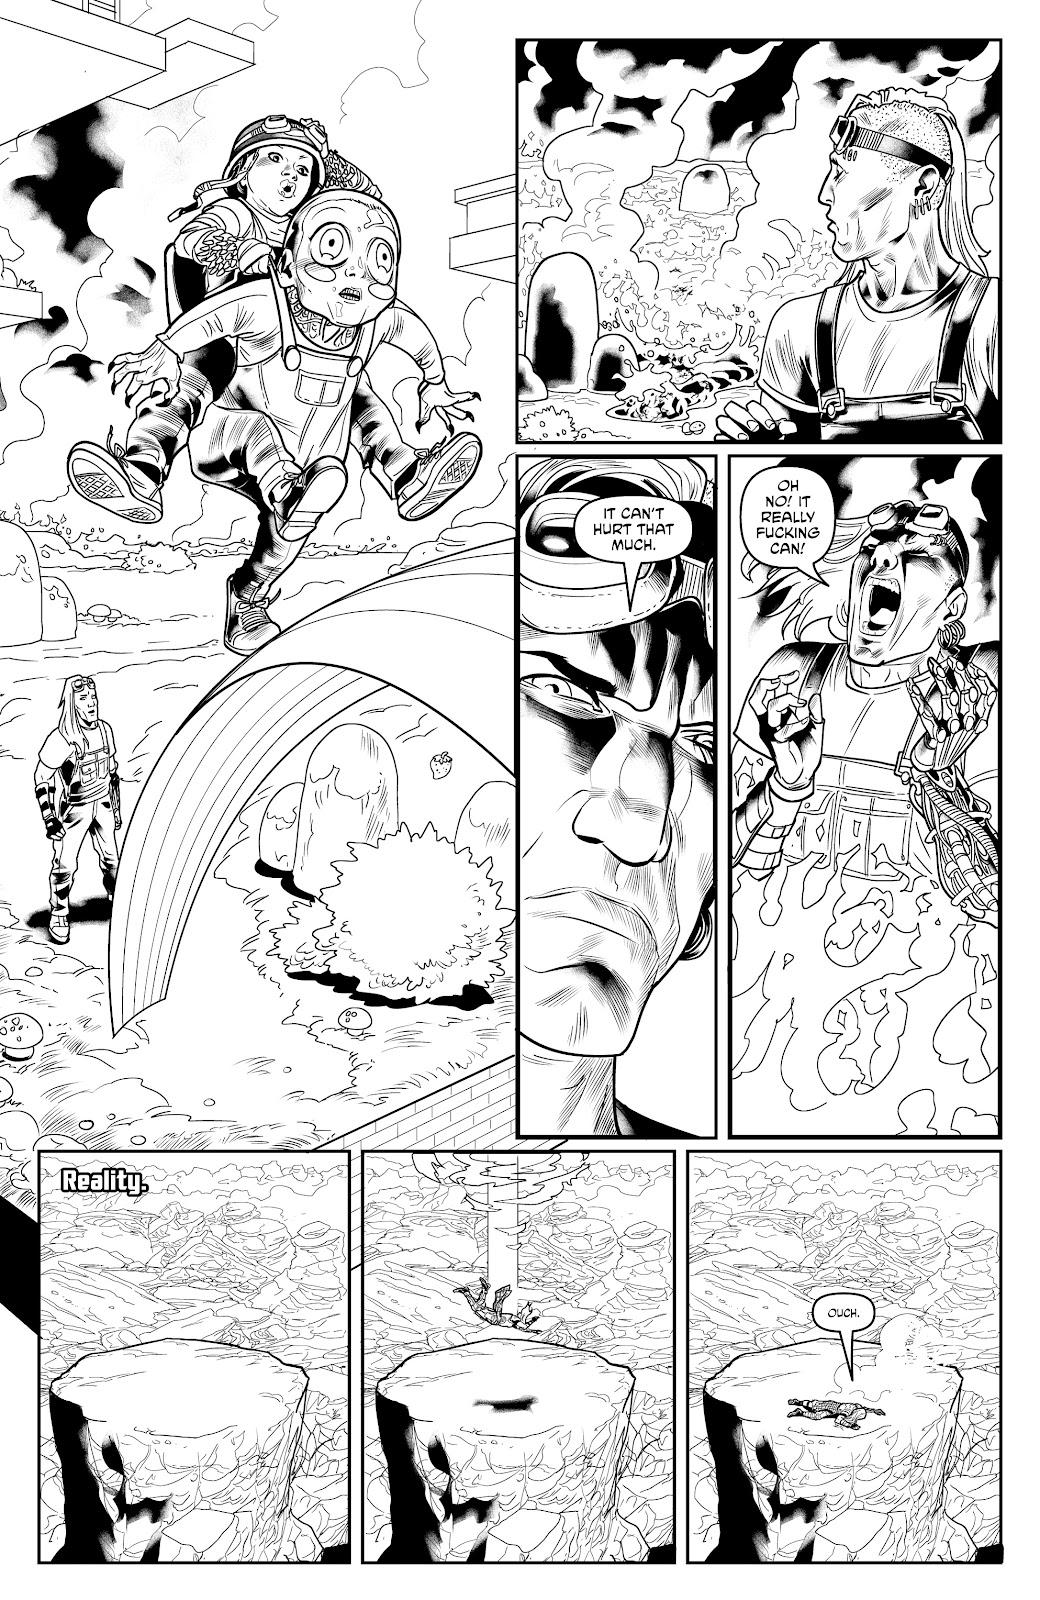 Read online Alan Moore's Cinema Purgatorio comic -  Issue #17 - 29